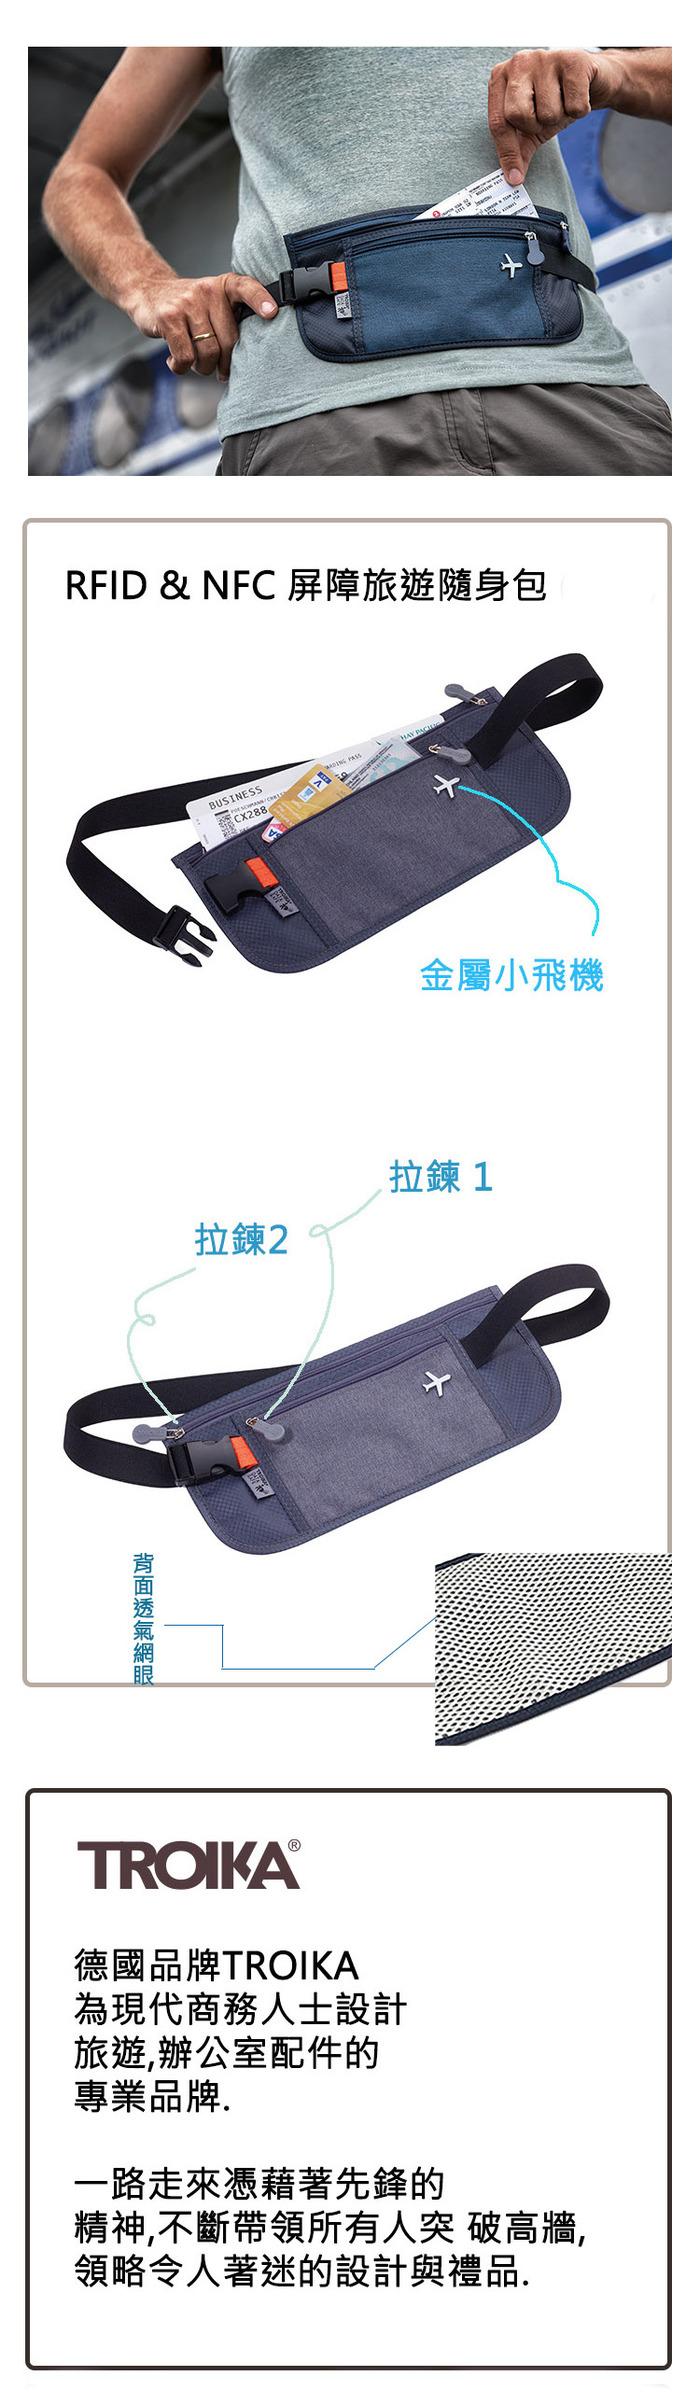 TROIKA|  RFID NFC 屏障旅遊隨身包 (藍色)